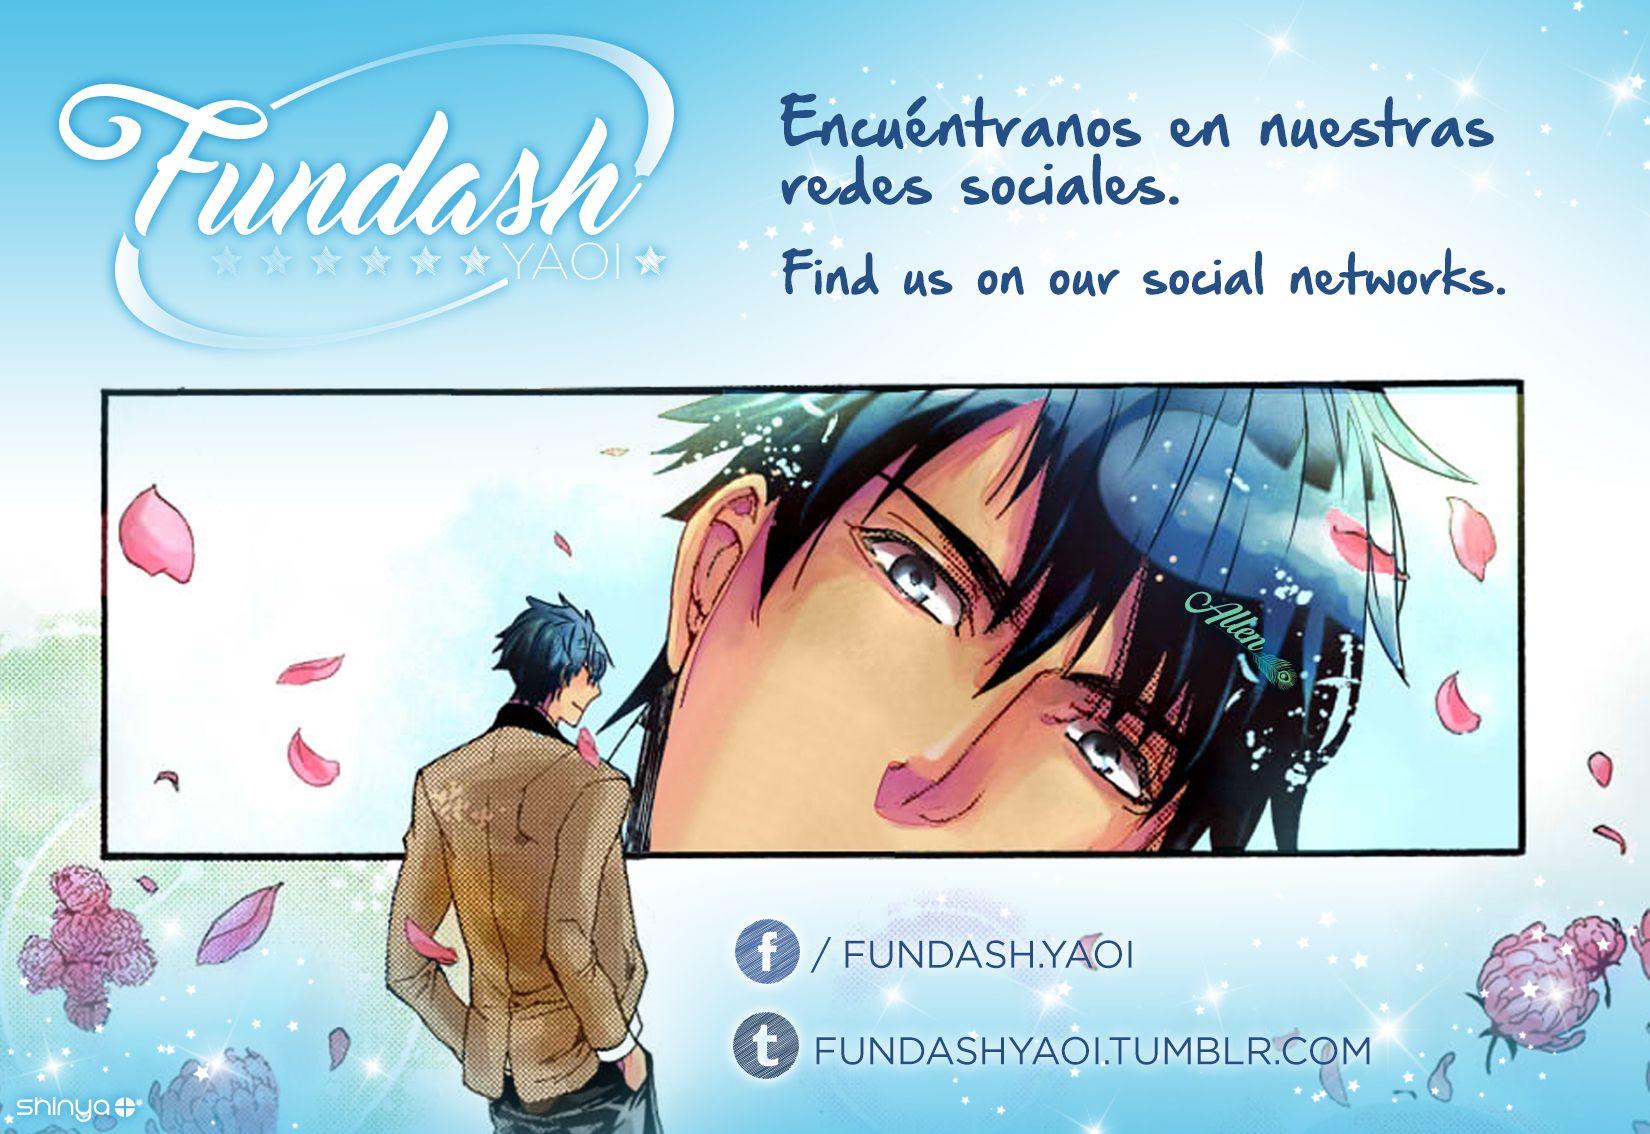 Kocchi Muite Ai Capítulo 1 Novel Cool Lee Novelas Ligeras En Línea Gratis Read Light Novels Online For Free